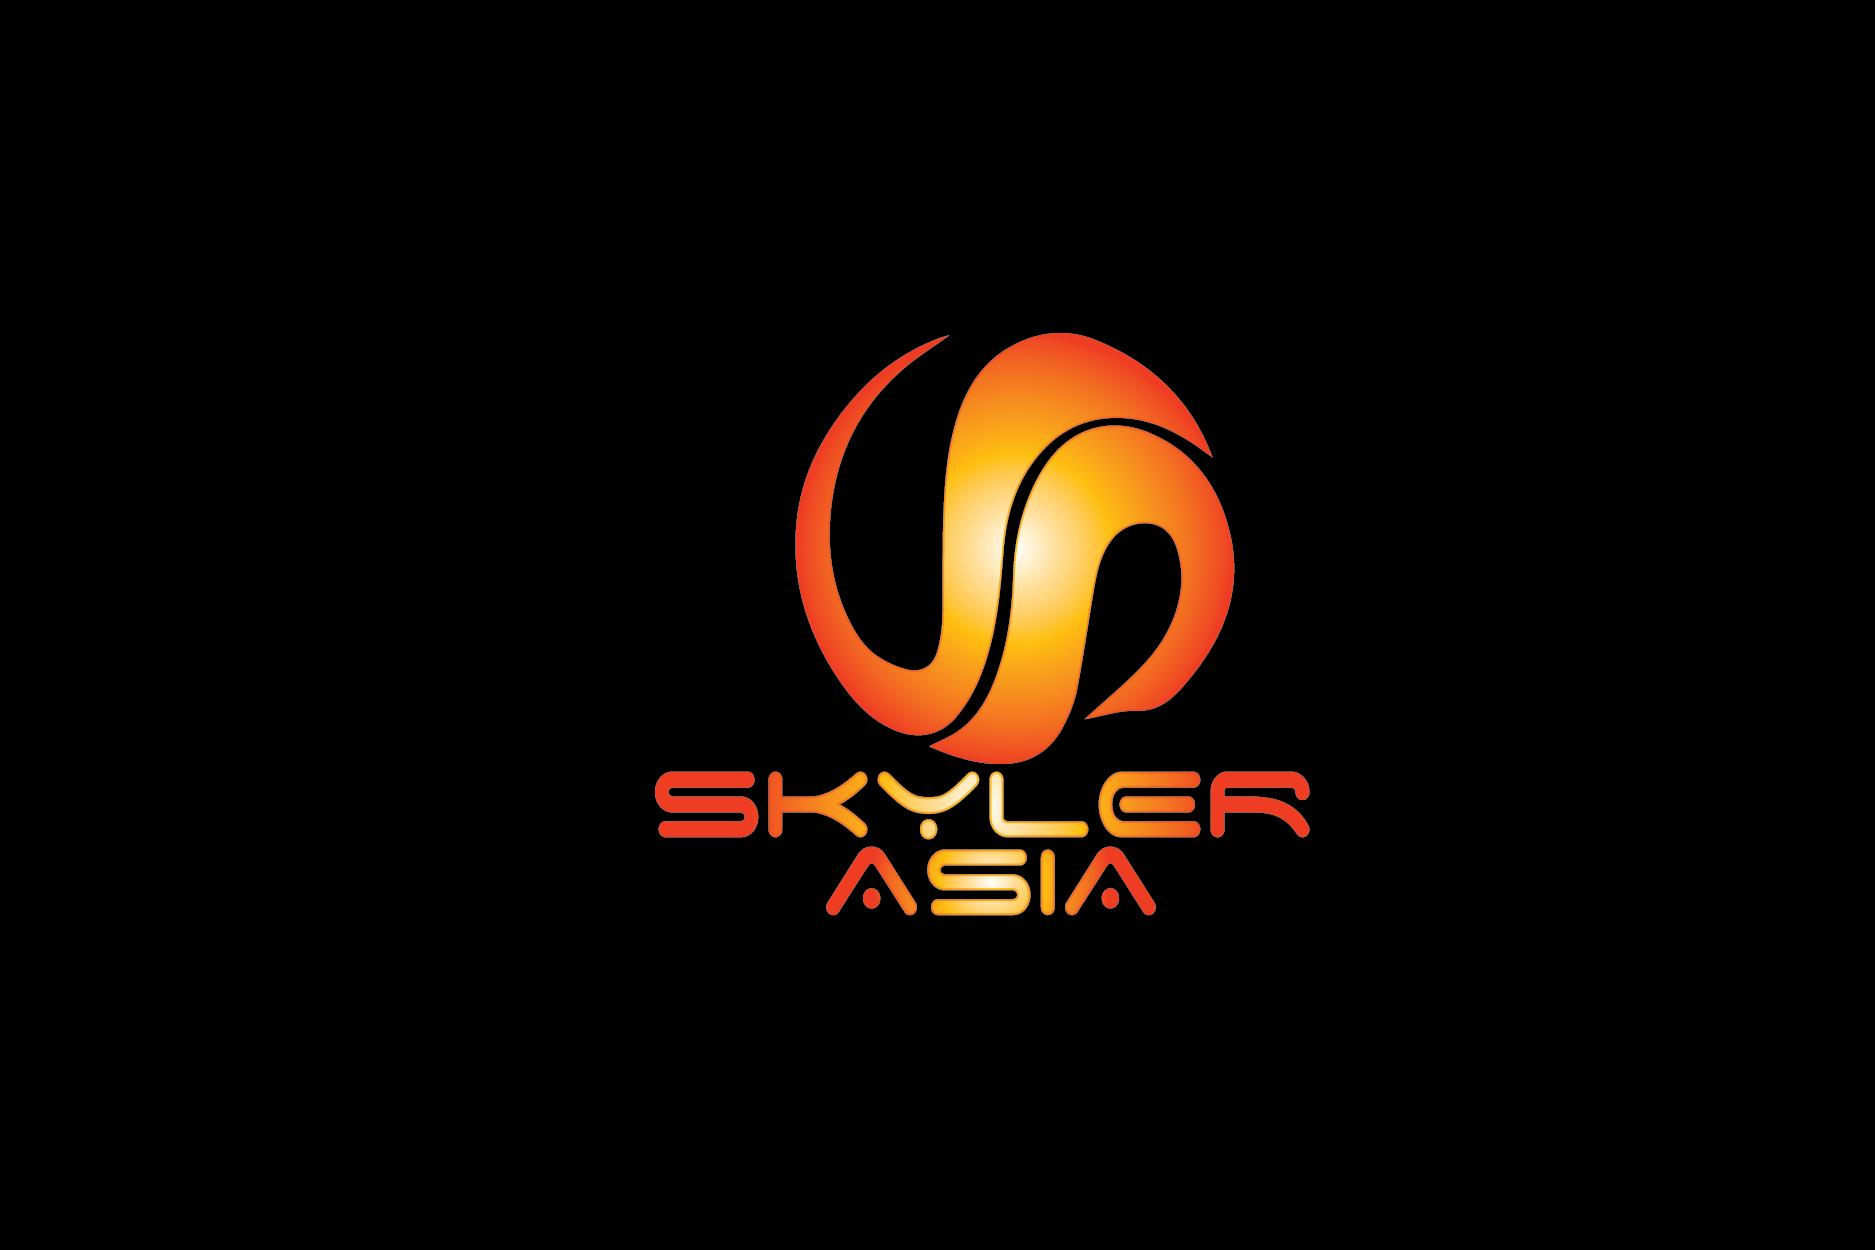 Logo Design by Private User - Entry No. 223 in the Logo Design Contest Artistic Logo Design for Skyler.Asia.